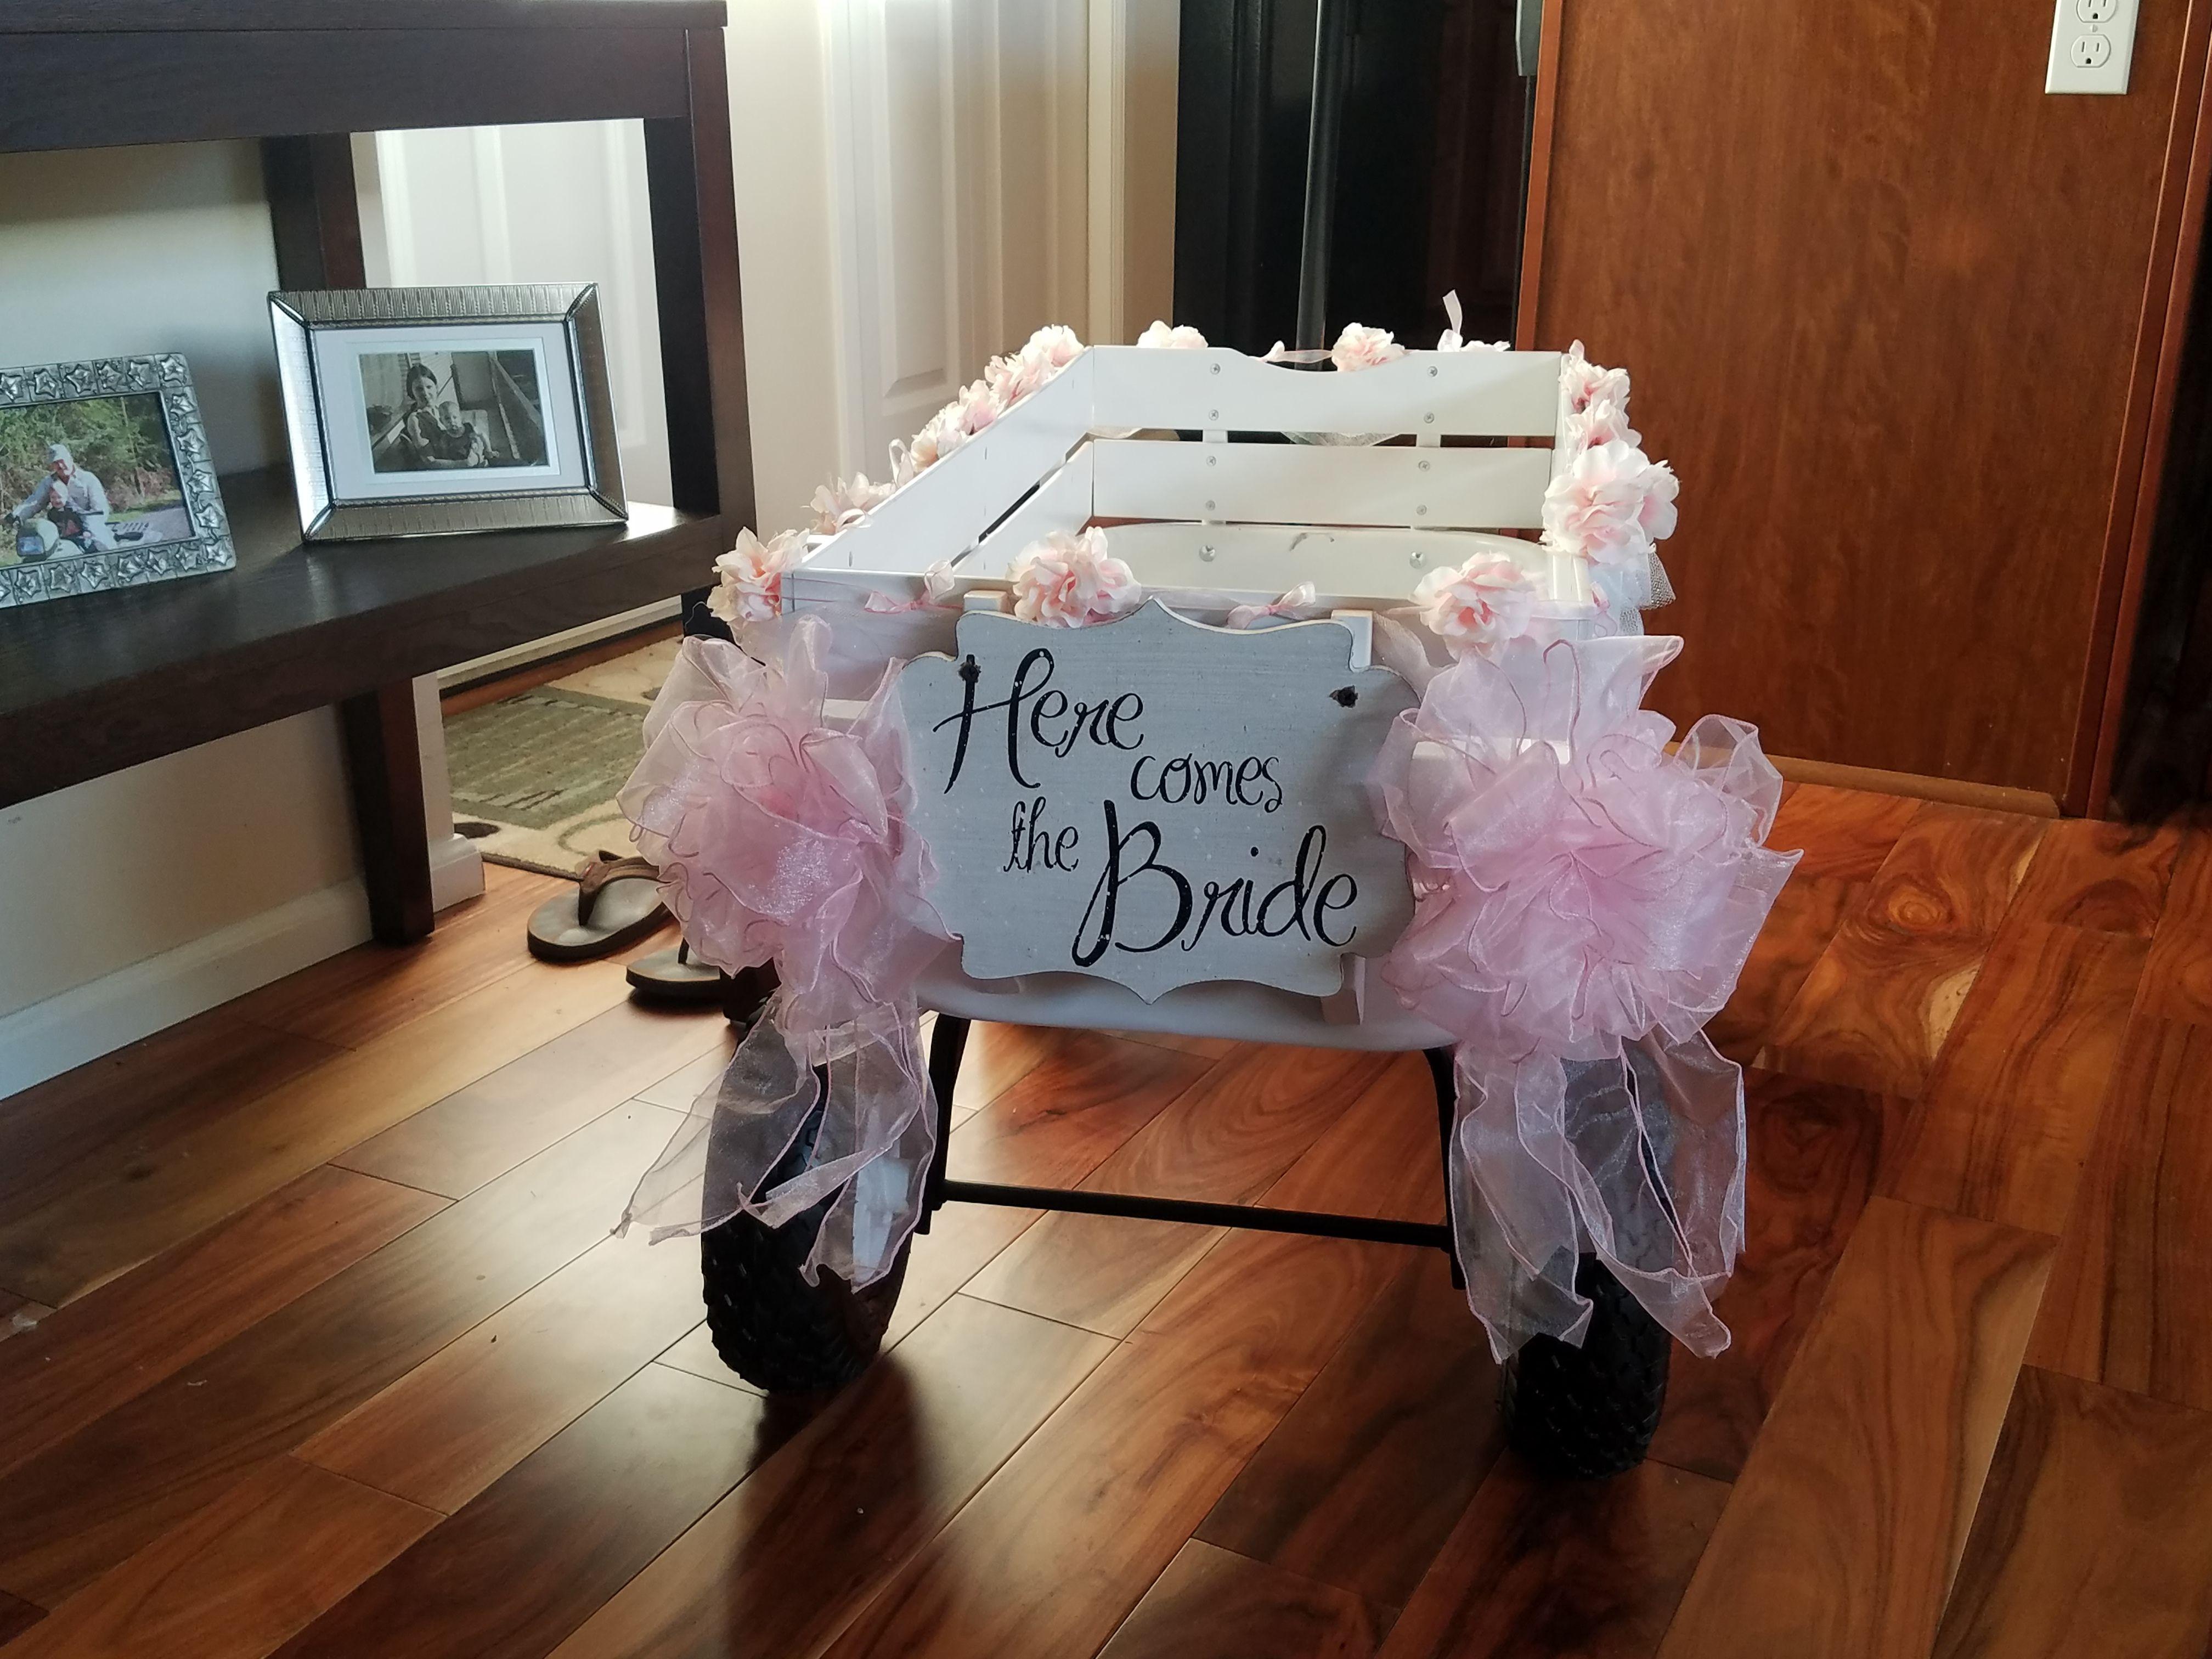 Pin by dadsrule babiesdrool on diy kids wagon for a wedding pinterest